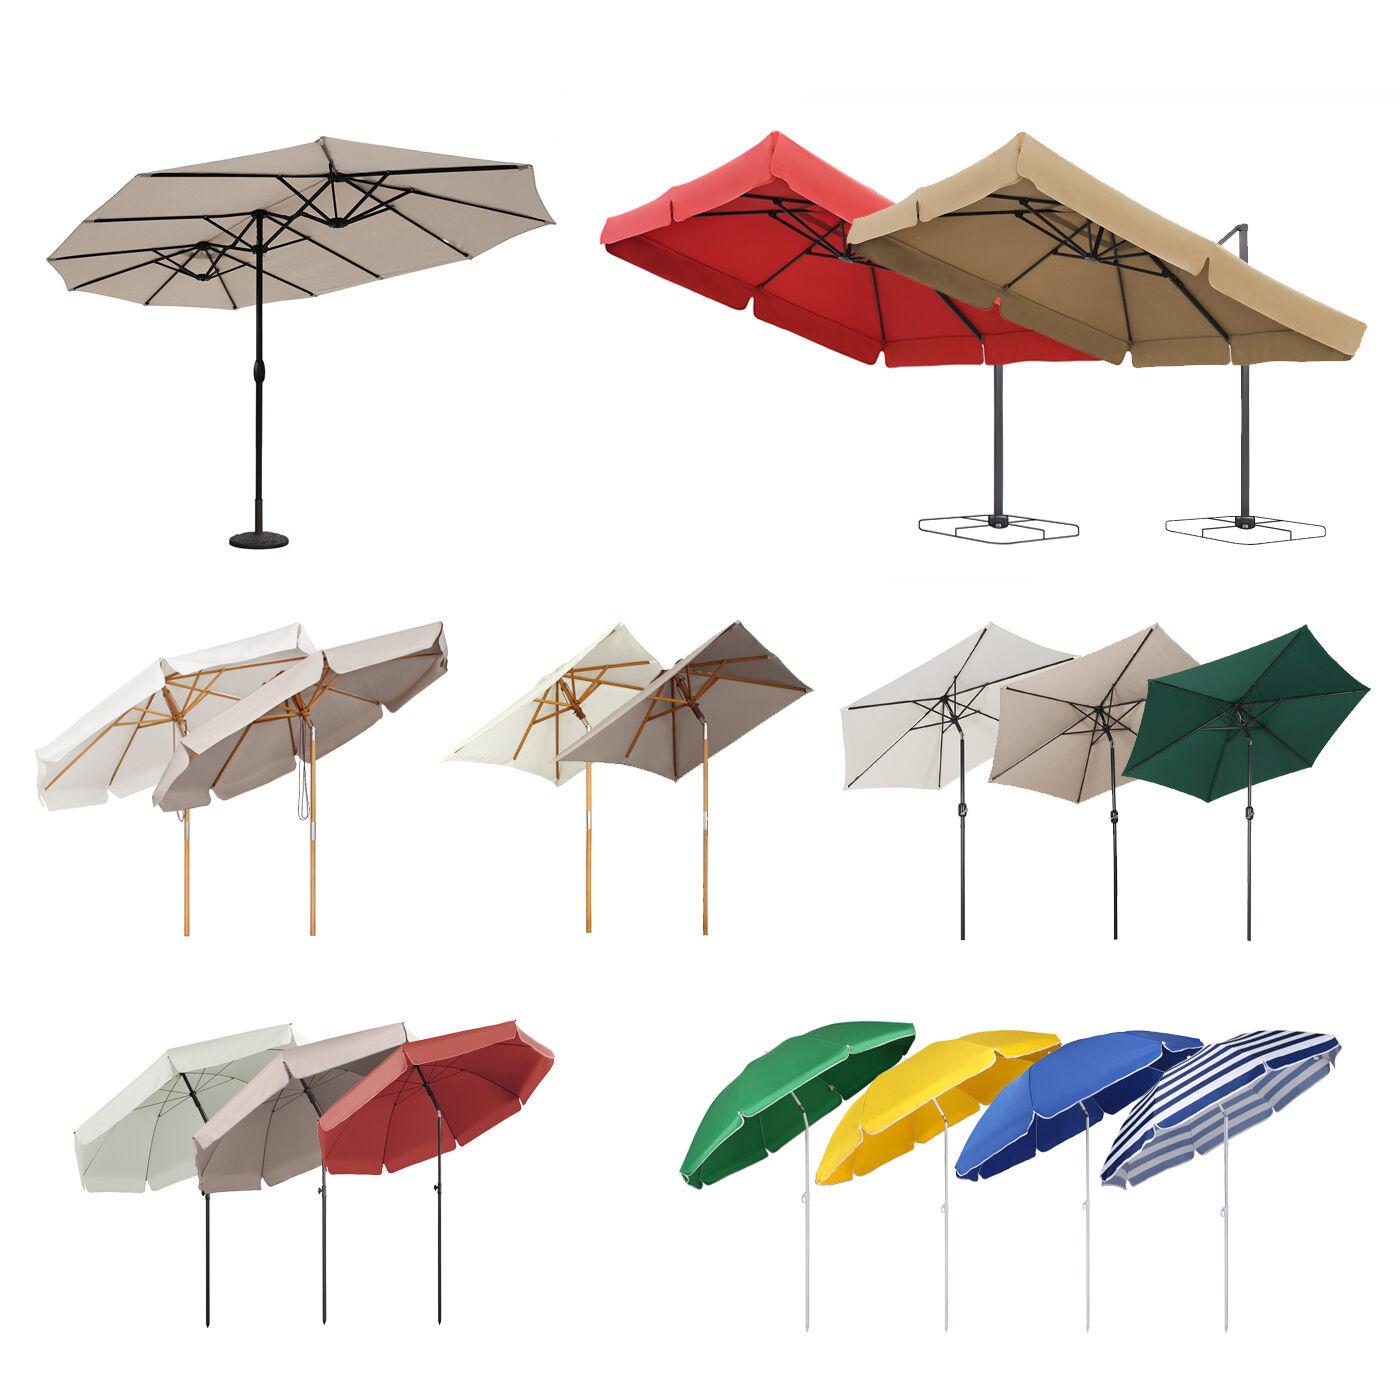 Qualitäts Sonnenschirm Ampelschirm Gartenschirm Marktschirm Kurbel Schirm Garten